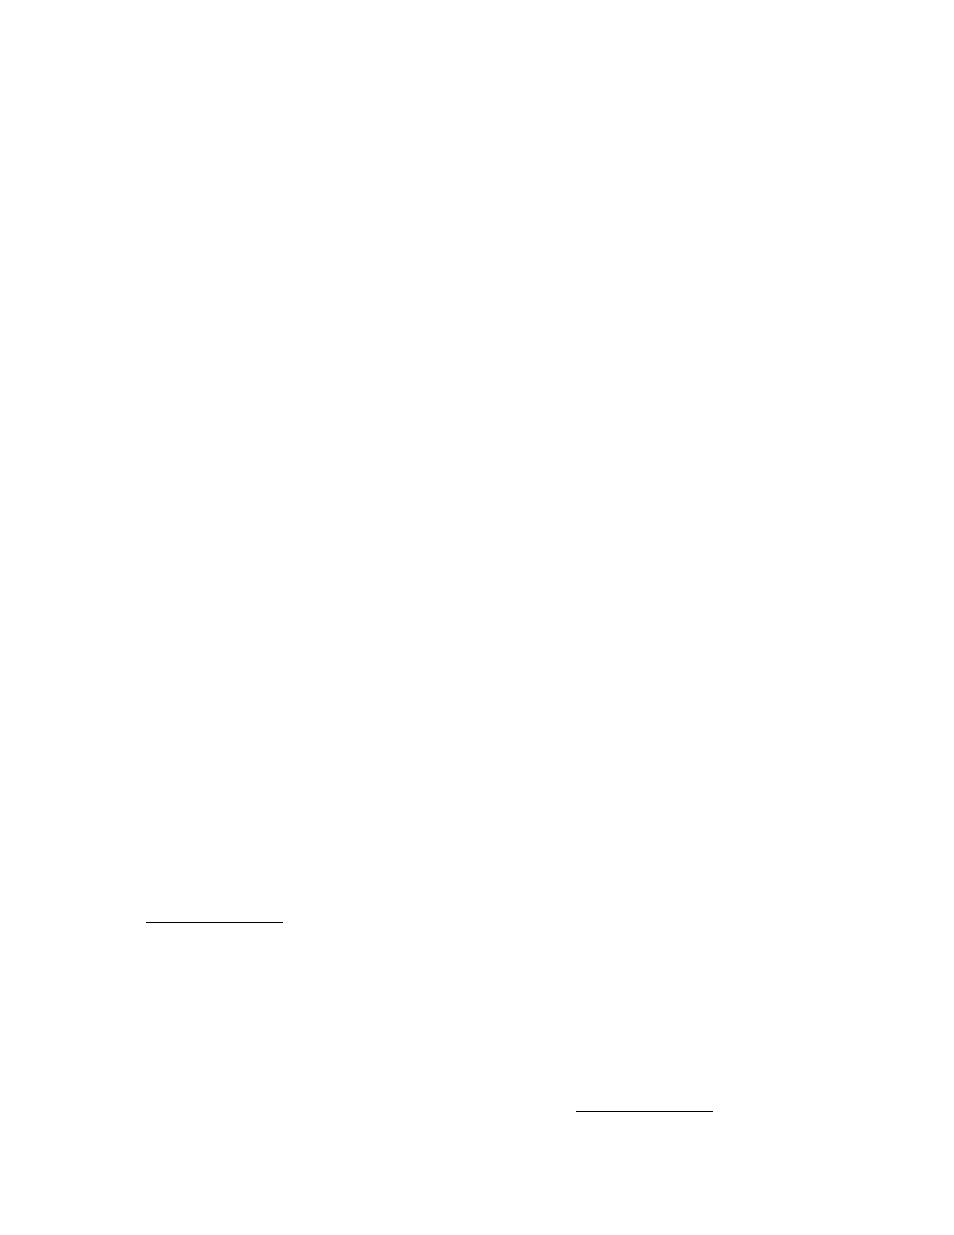 Section 4  commands, Insta-change checks, Micrbase setup program for